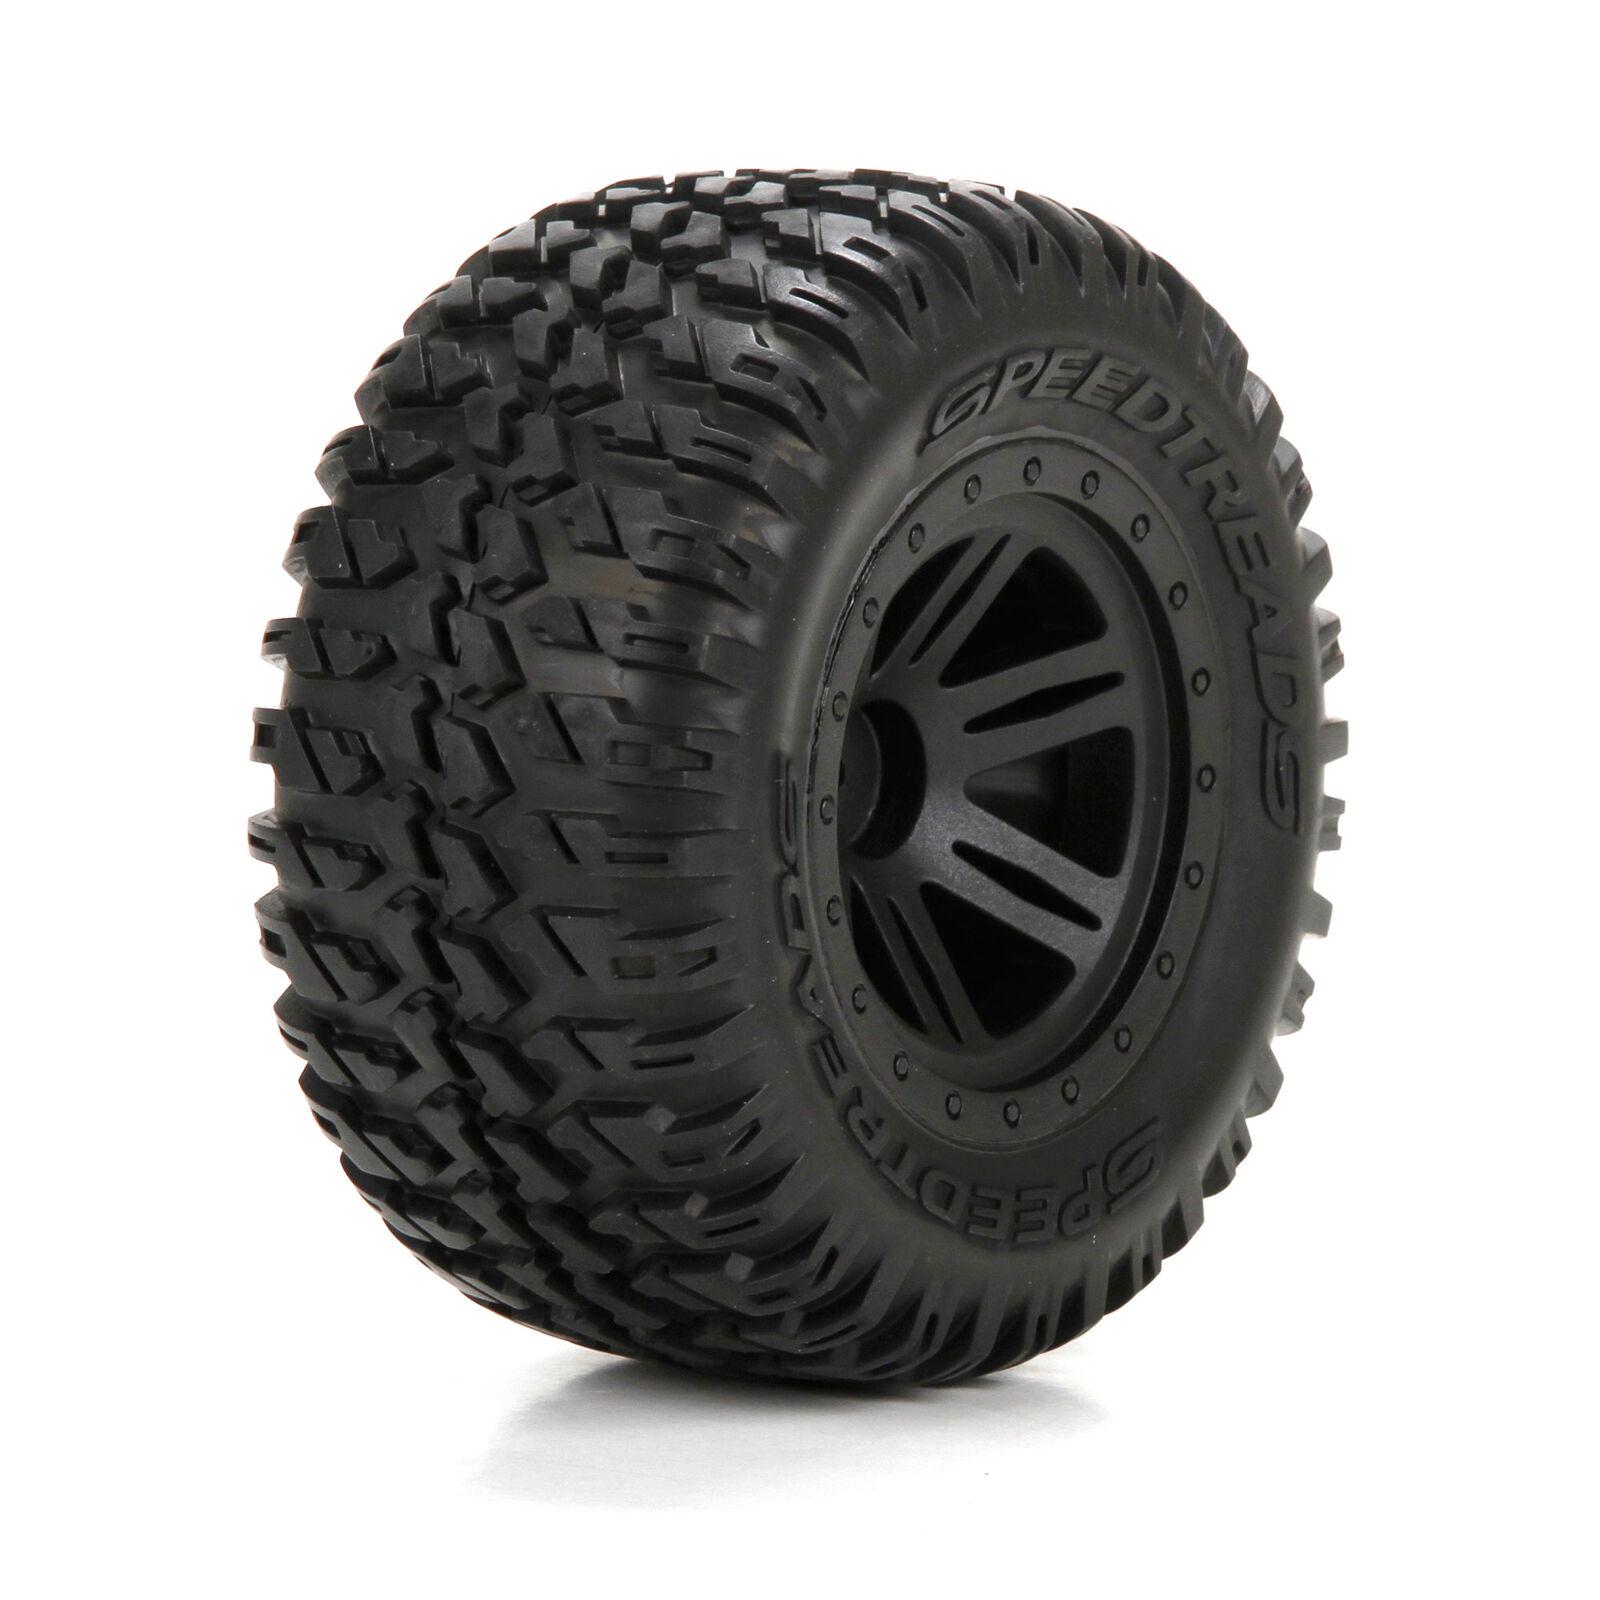 Front/Rear Tire, Premounted, Black Wheel (2): 1/10 AMP MT/DB